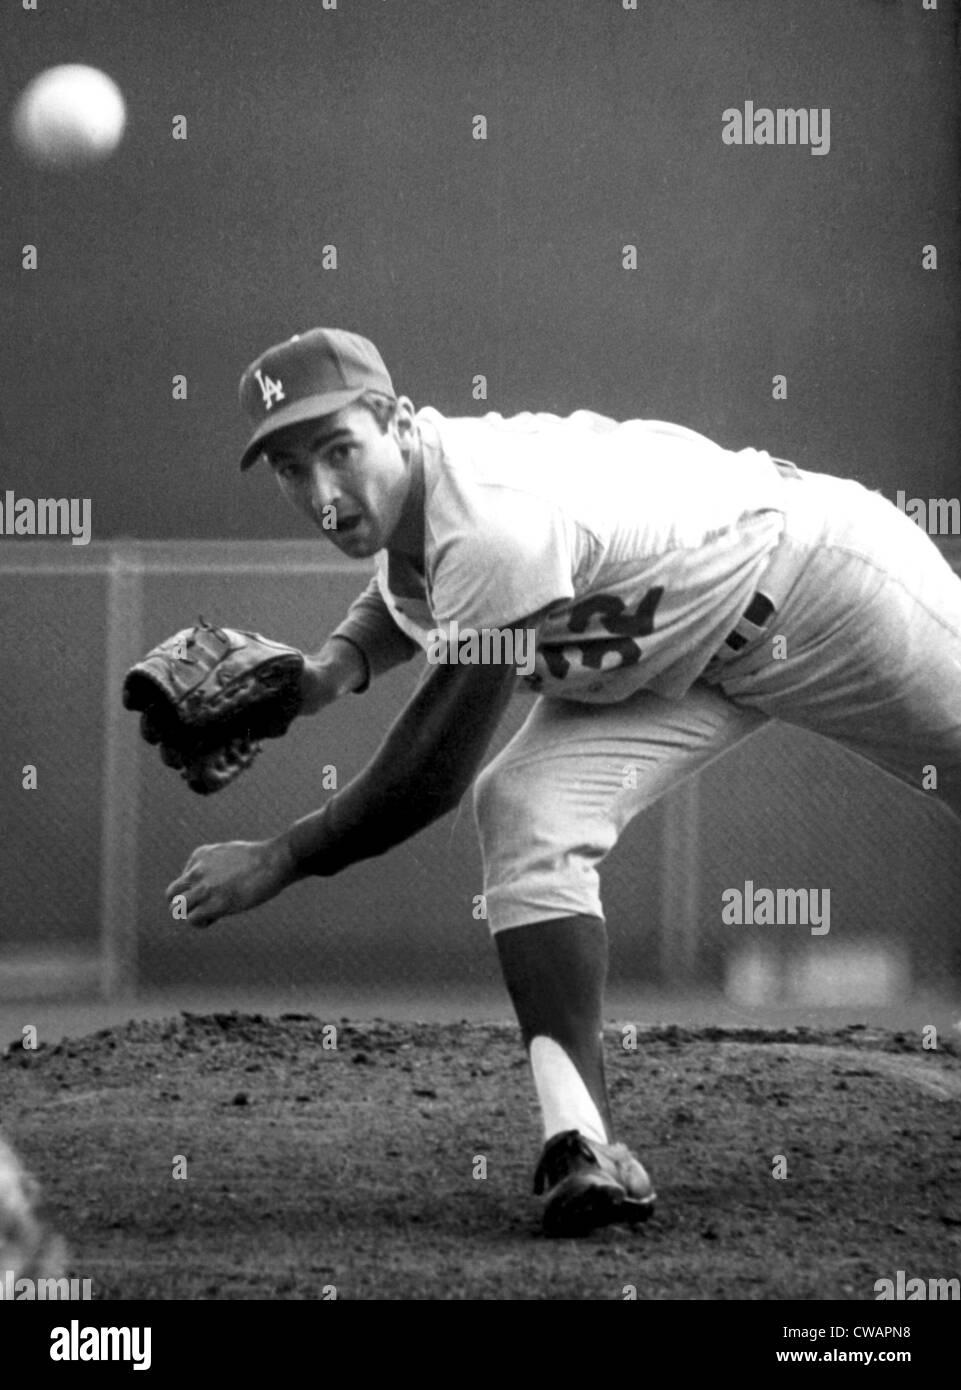 L.A. Dodgers pitcher SANDY KOUFAX, 1965. Courtesy: CSU Archives / Everett Collection Stock Photo